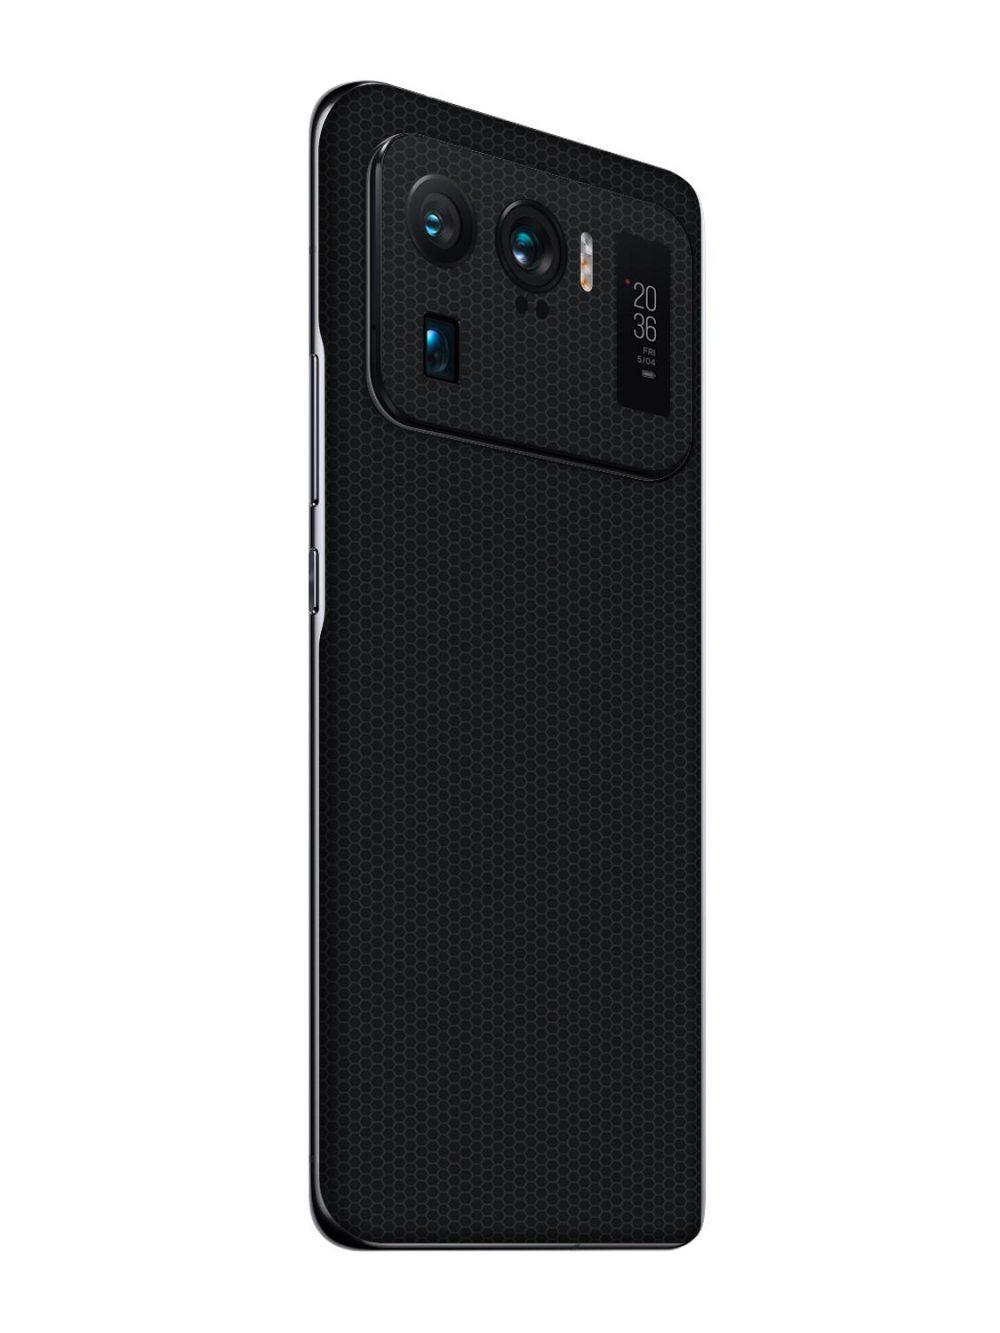 Xiaomi Mi 11 Ultra skin wrap skins uk